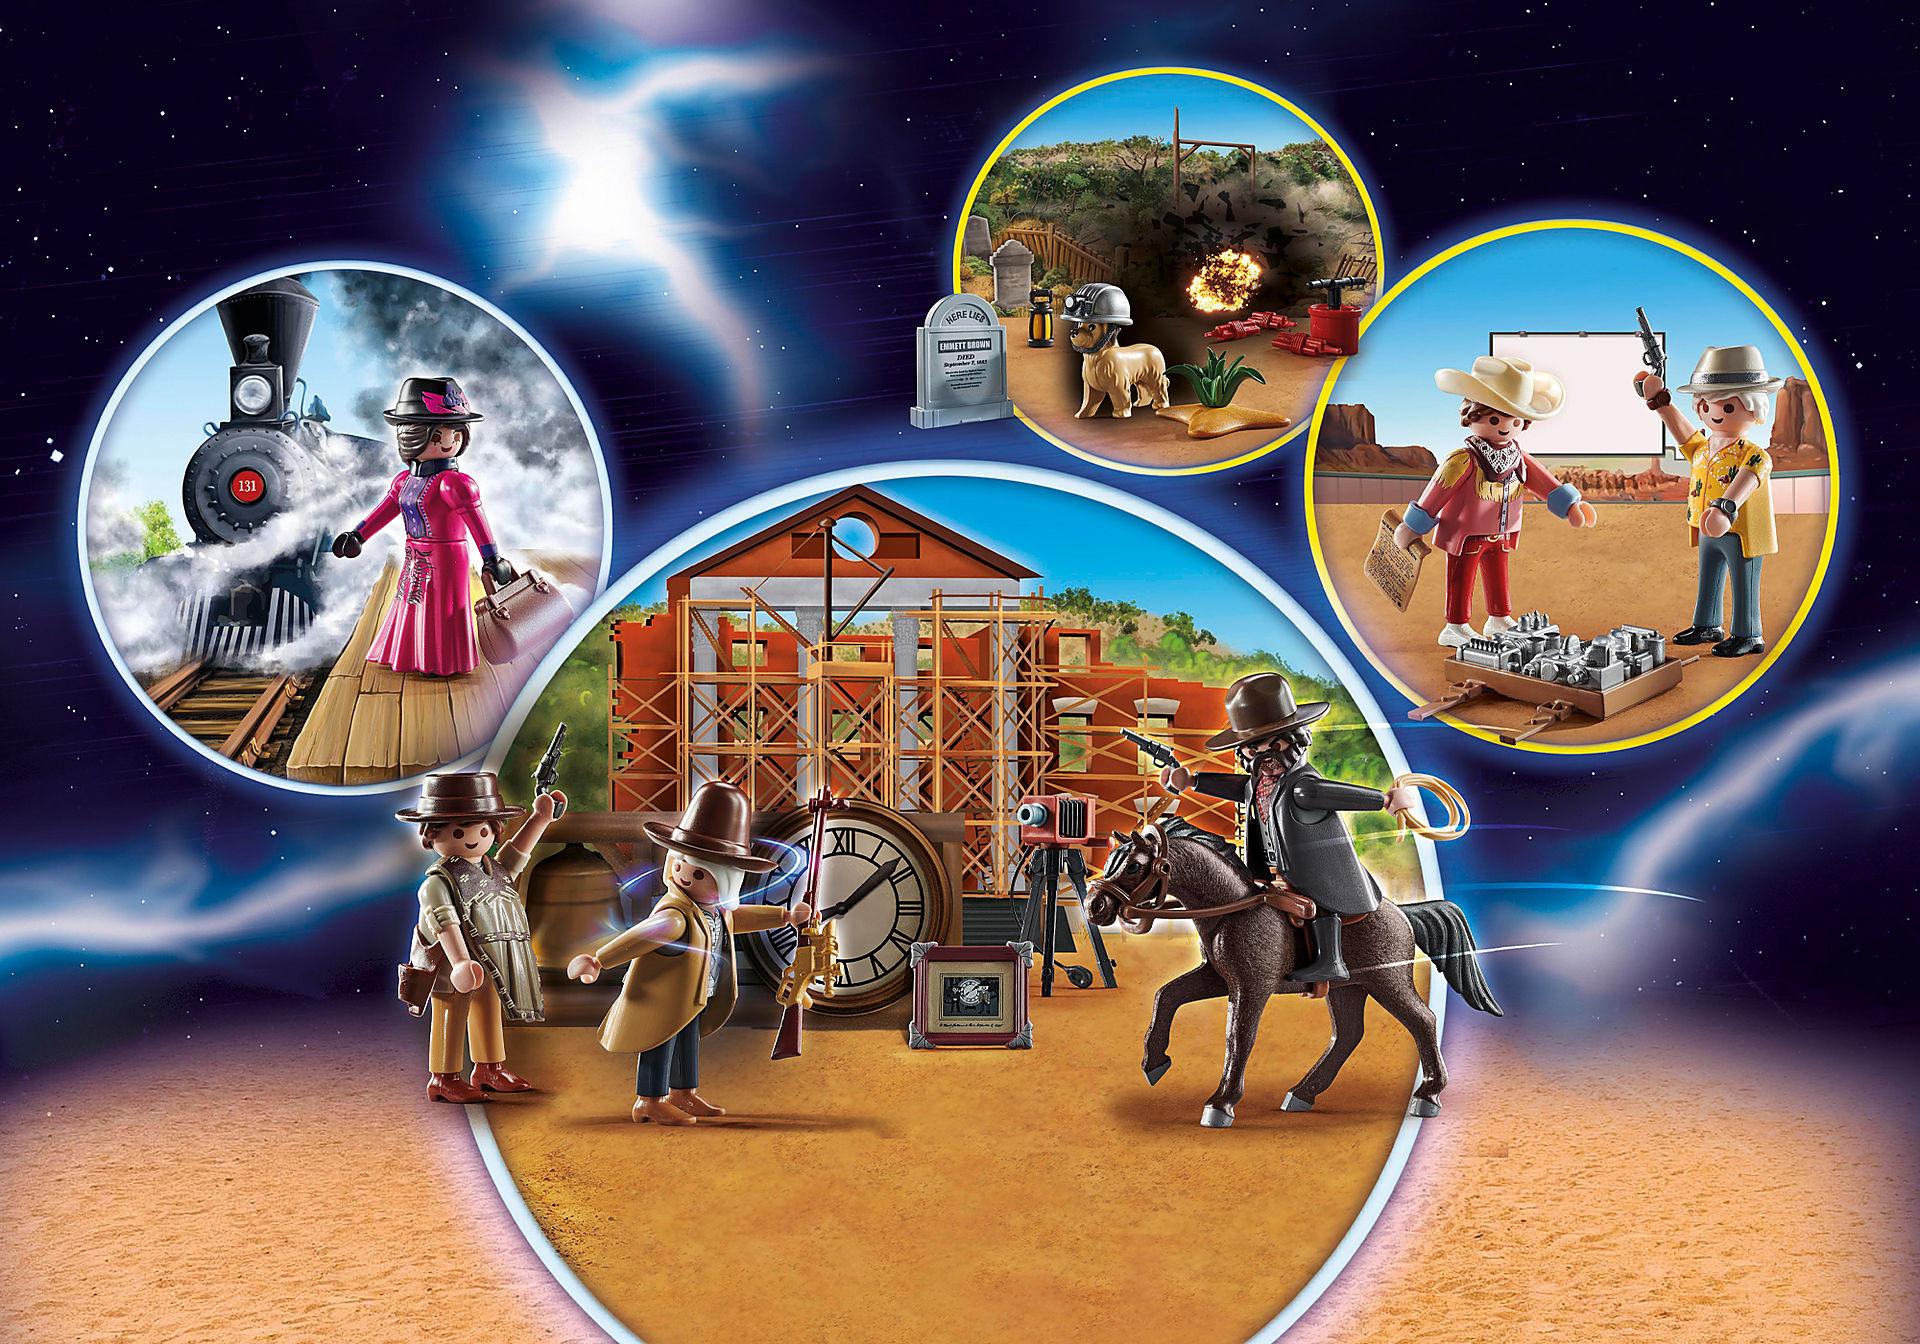 70576 Advent Calendar - Back to the Future III zoom image3